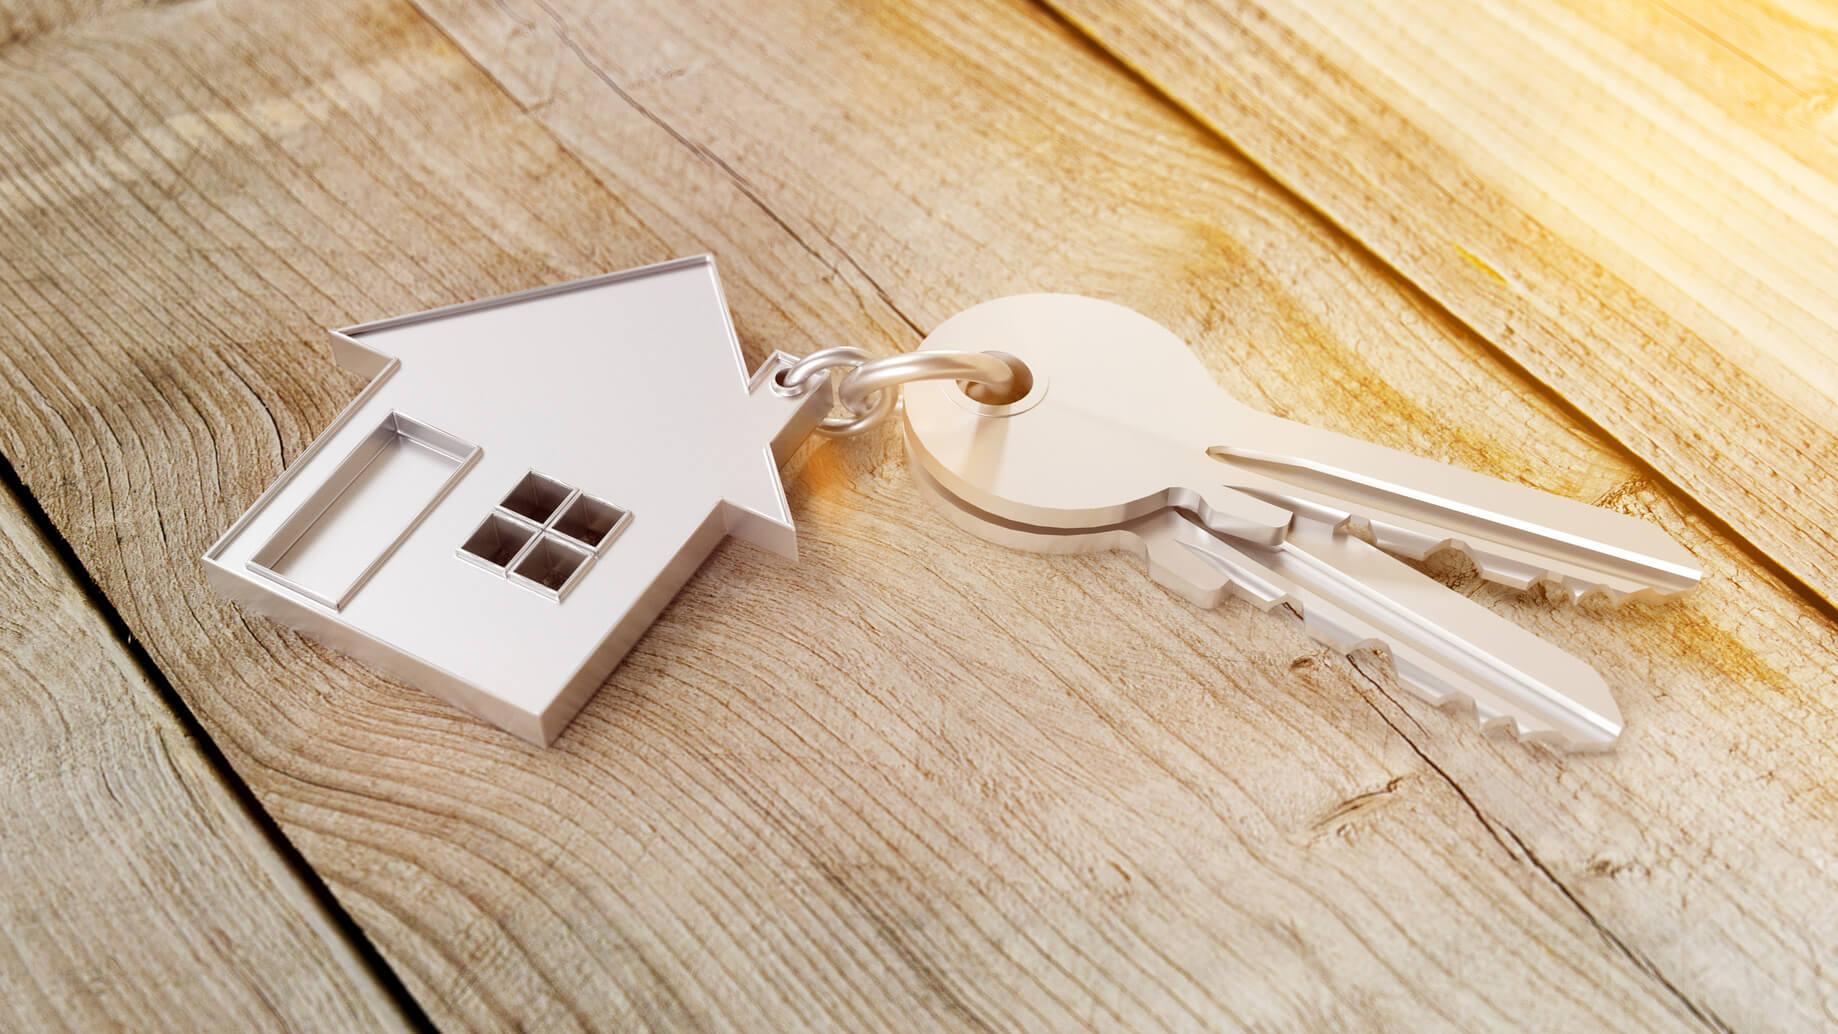 casa noua, bani, economii